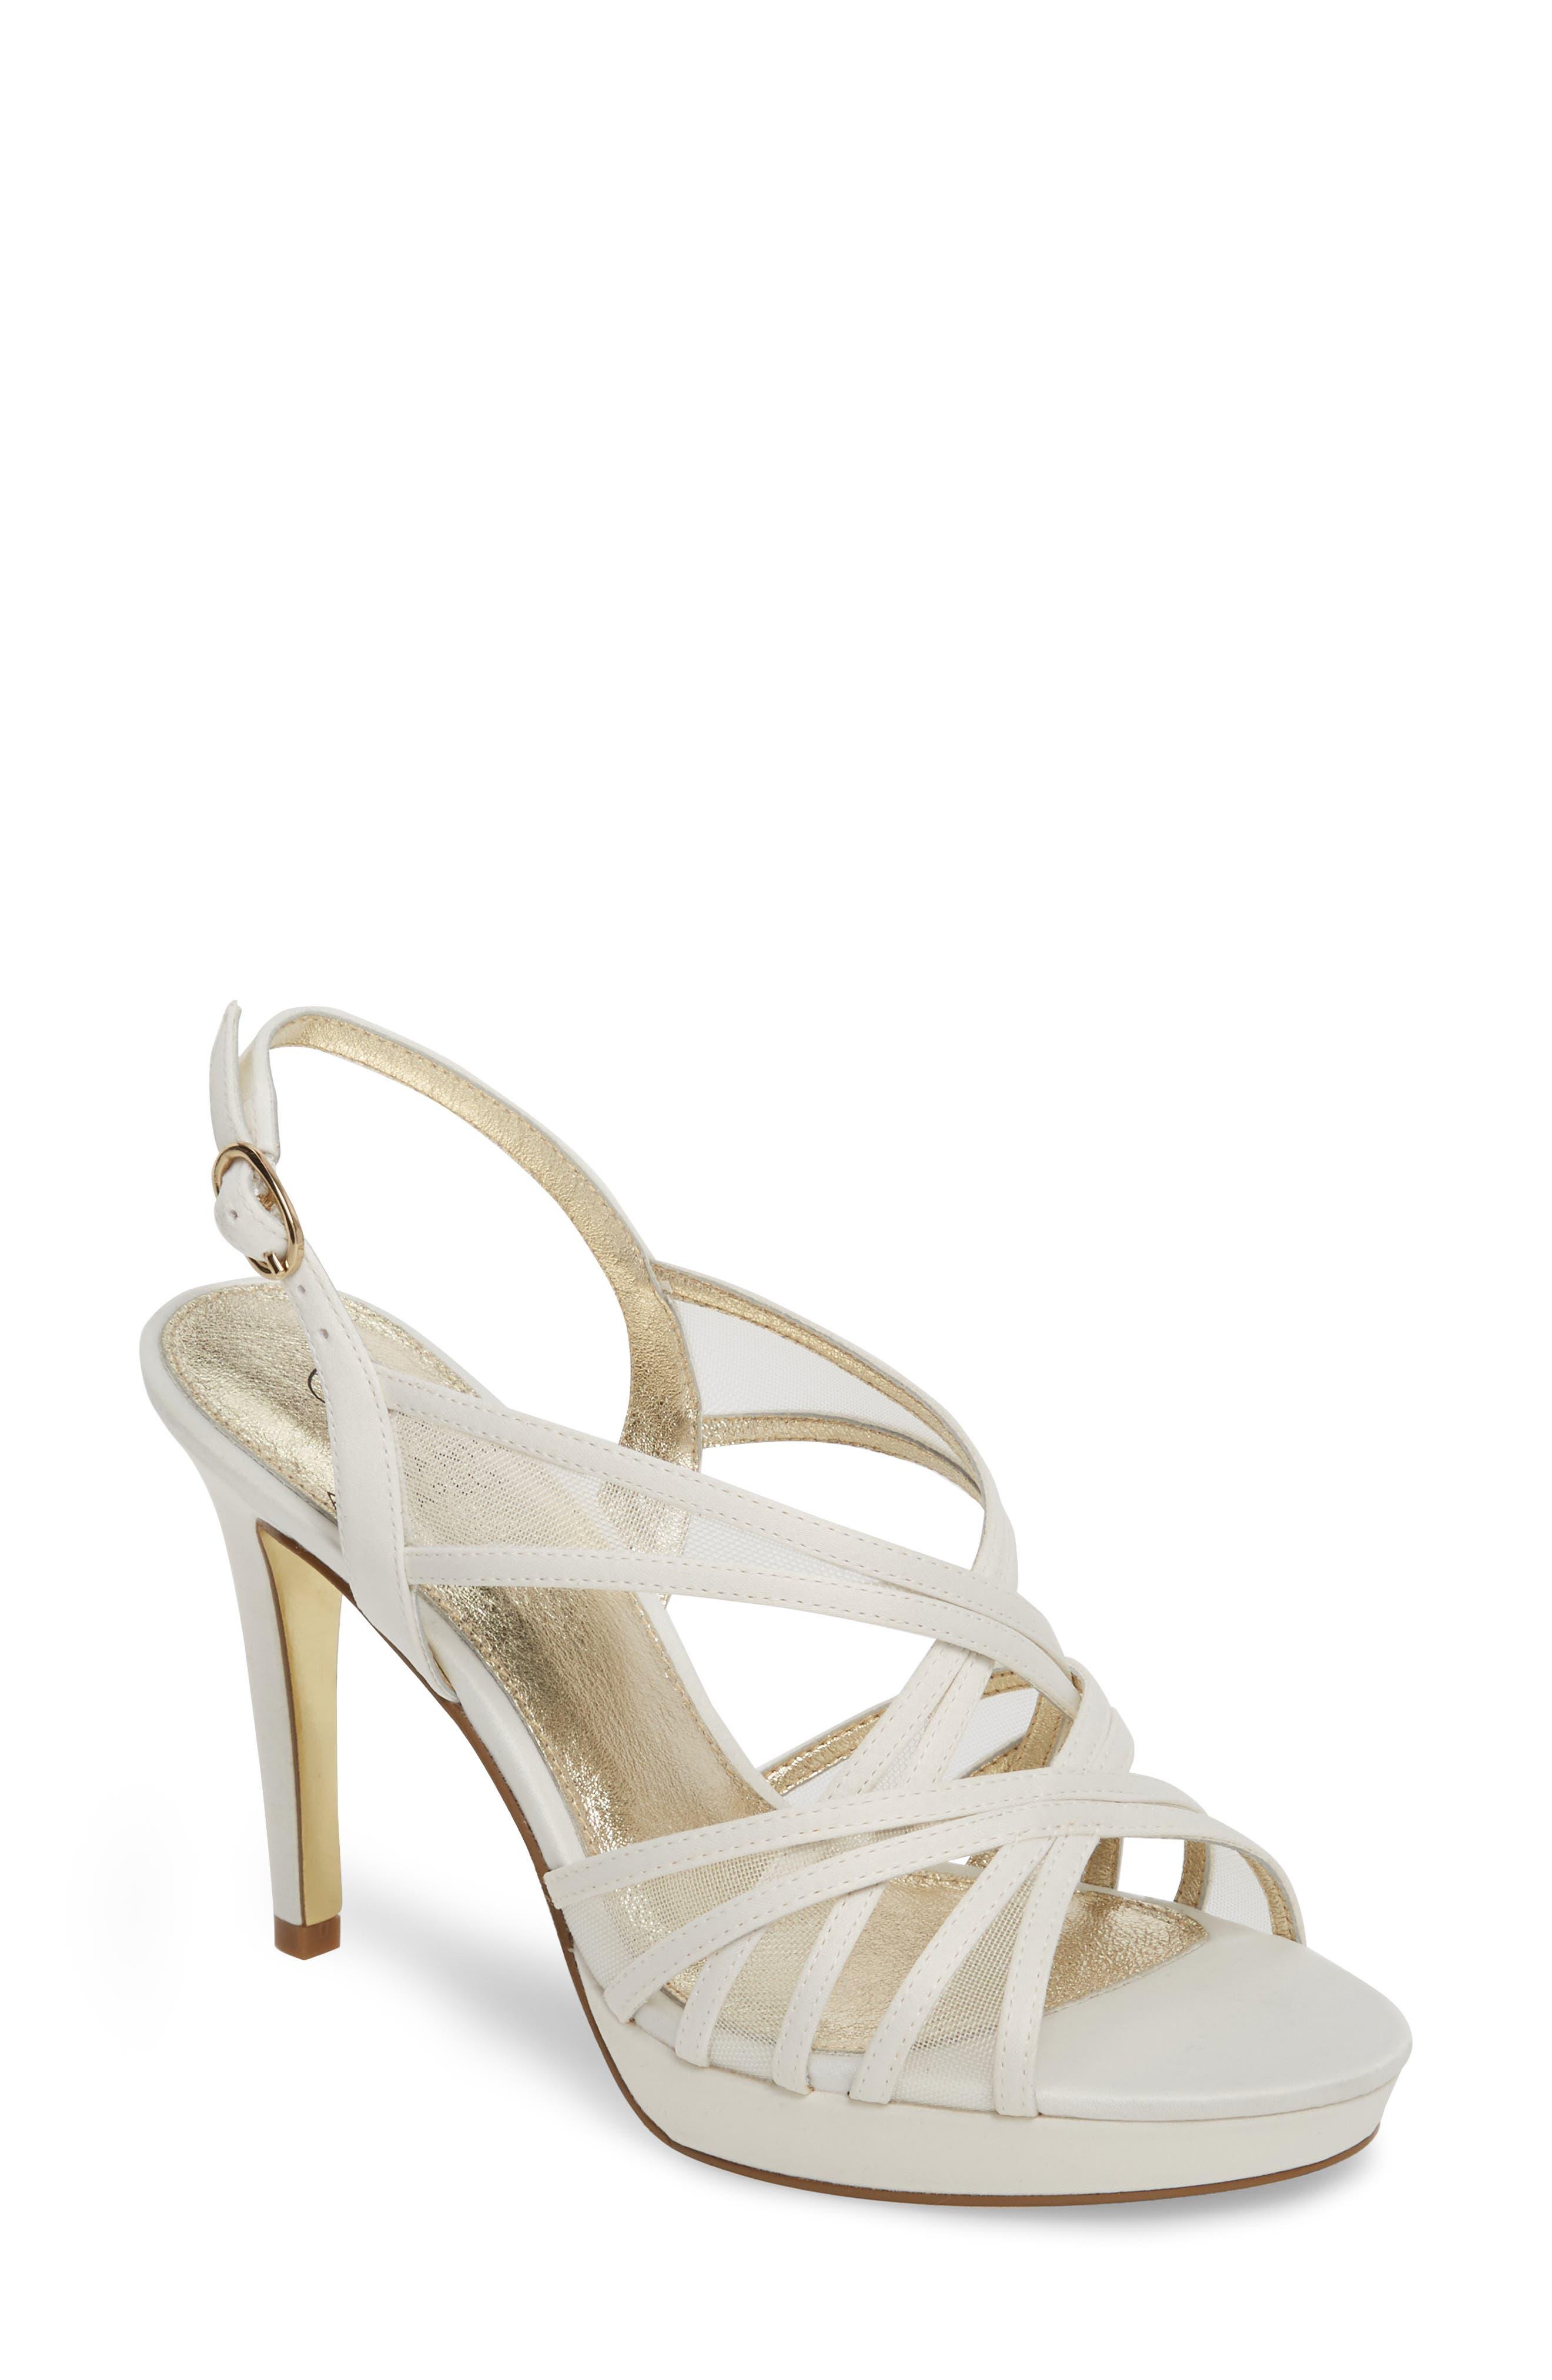 Adrianna Papell Adri Platform Sandal- White